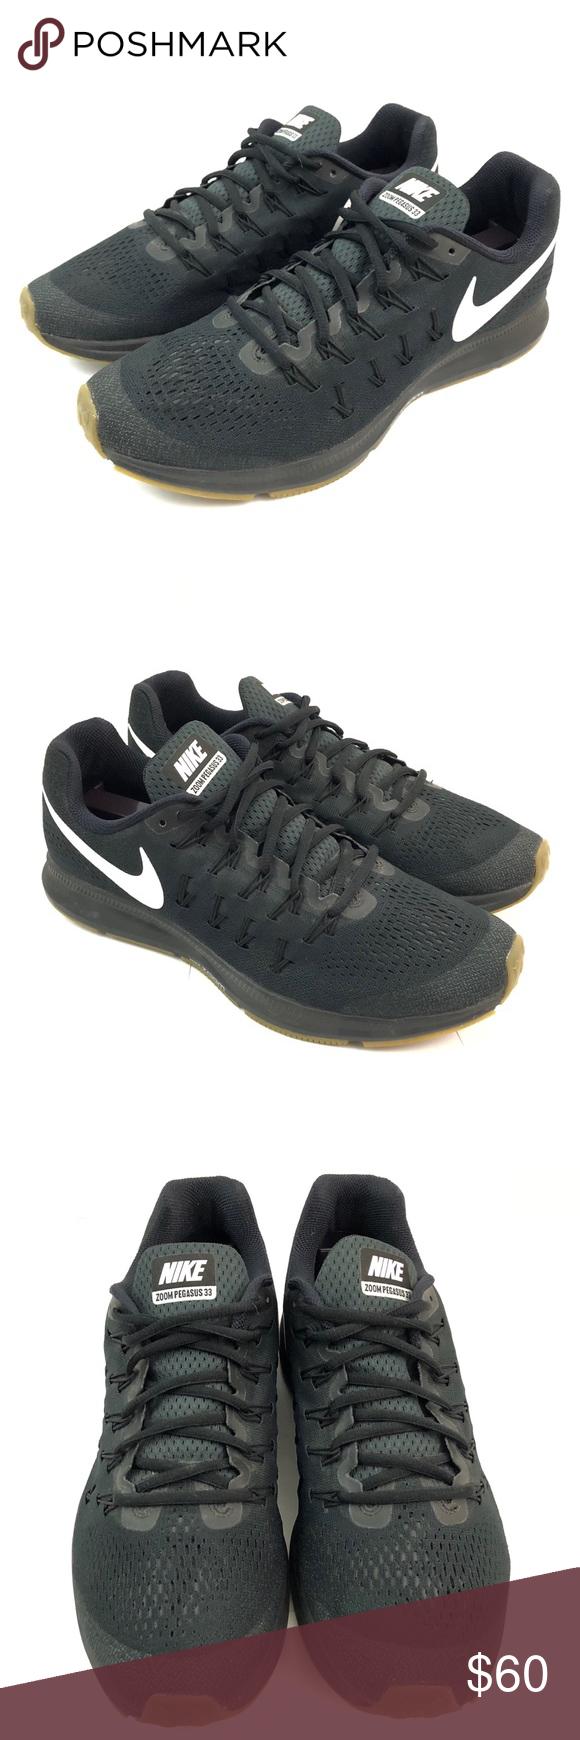 14aa6ae813ac3 Nike Shoes Zoom Pegasus 33 NikeiD Black Mens US 9 Nike Mens Shoes Zoom  Pegasus 33